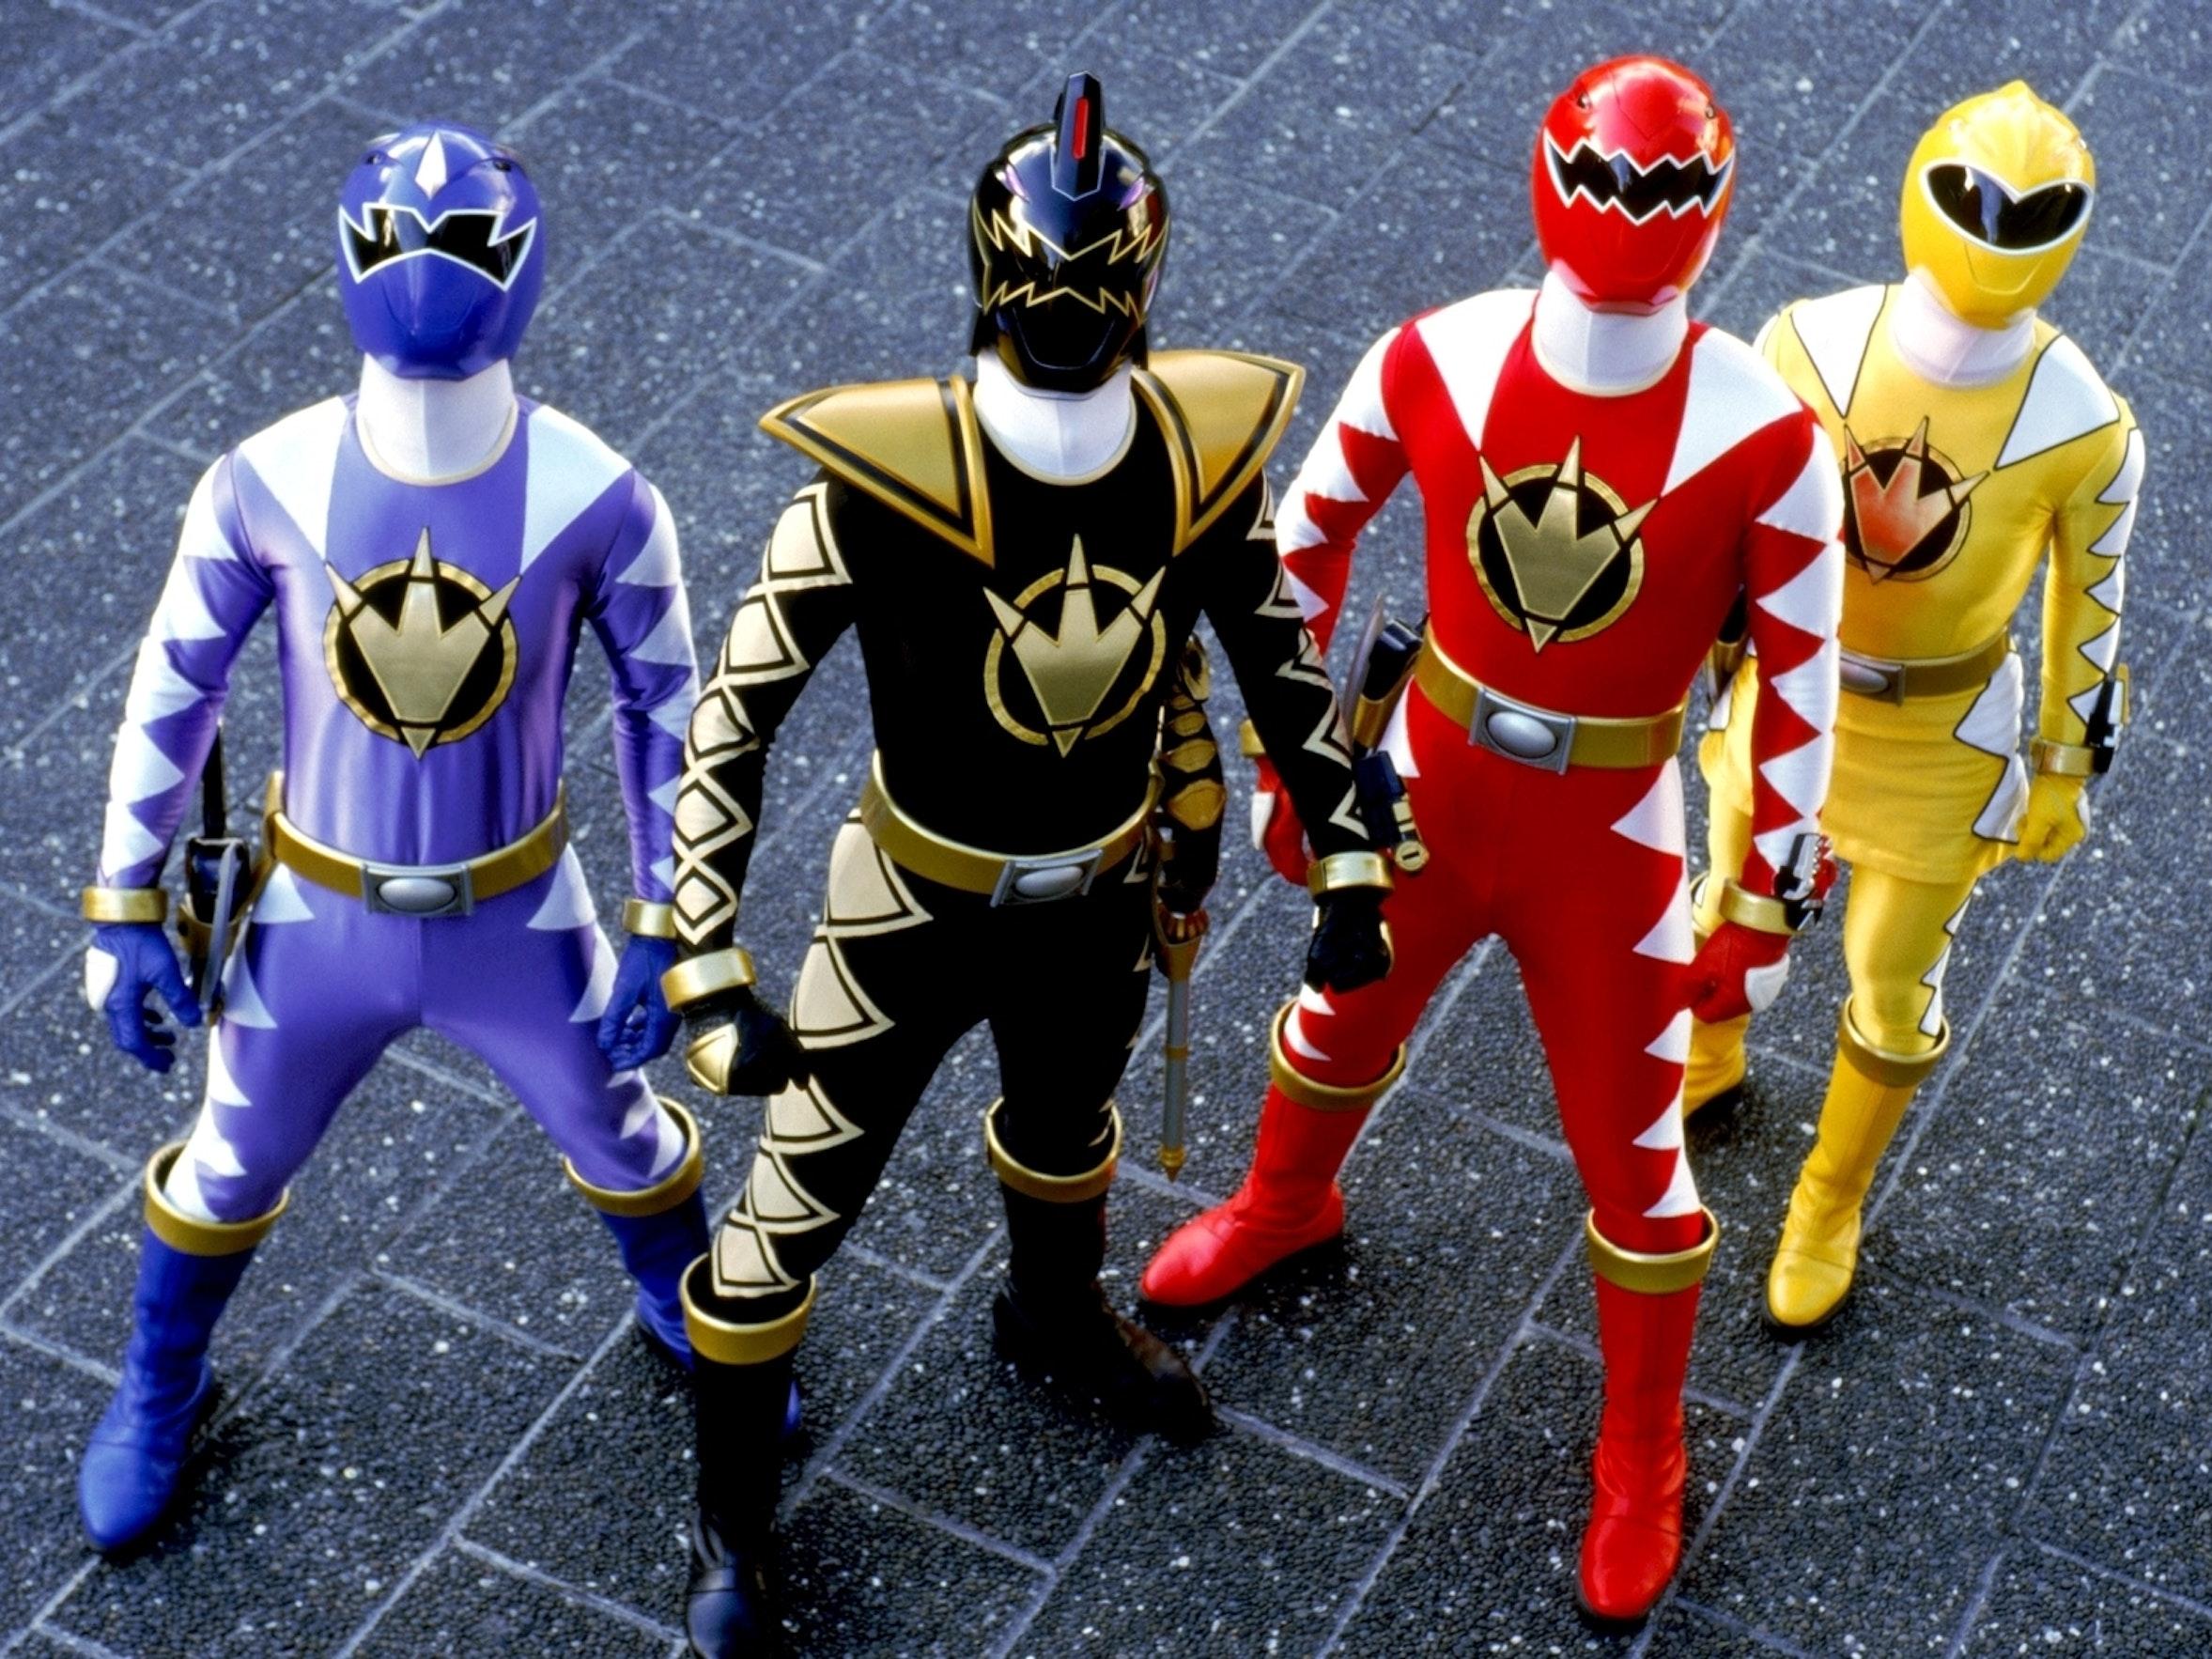 The Best 'Power Rangers' Reboot Happened in 2004